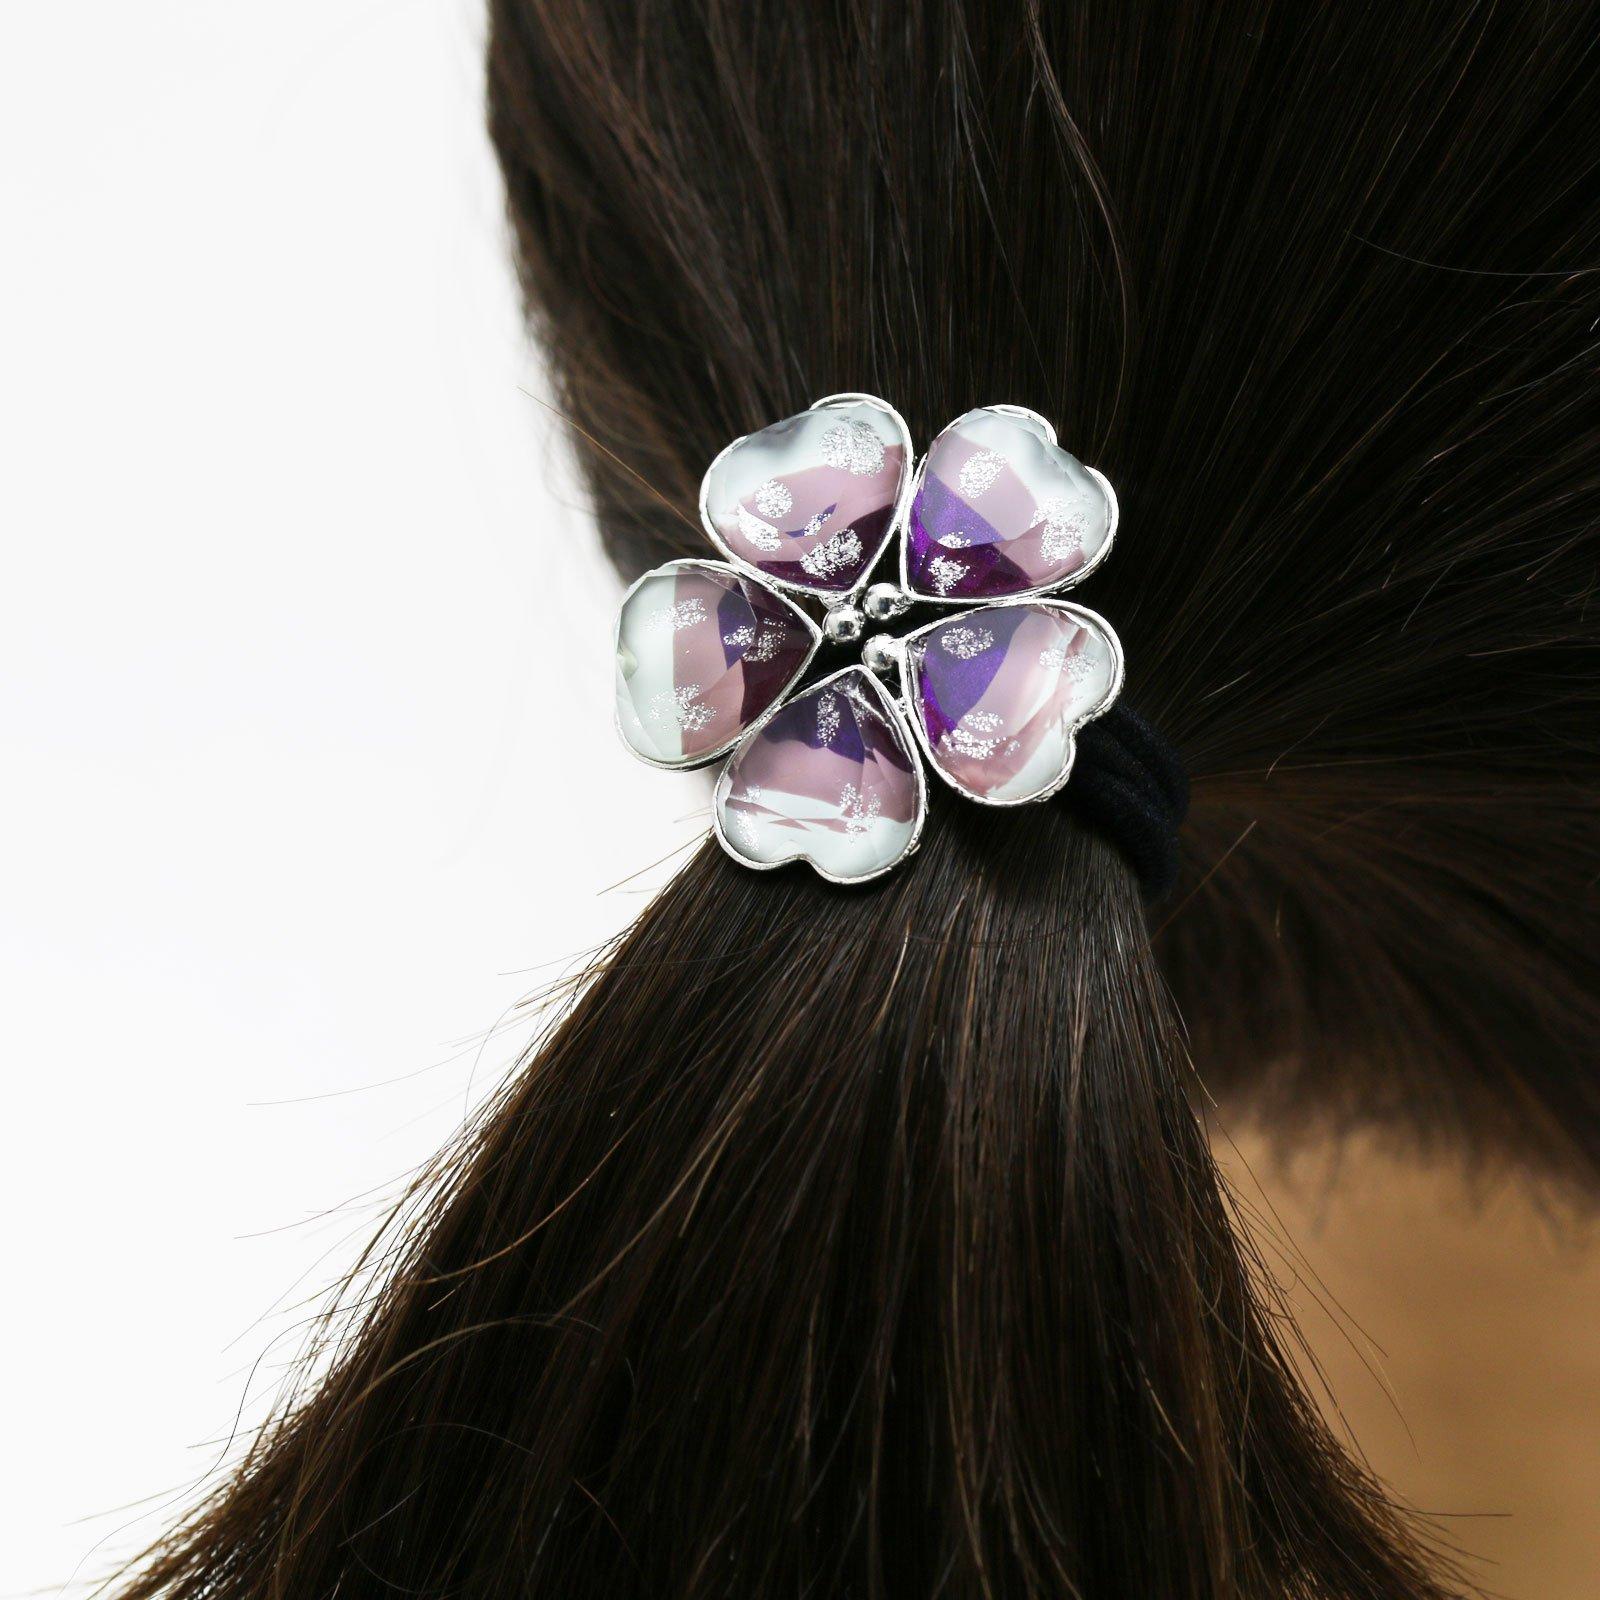 Tamarusan Ponytail Holder Purple Gradient Rainbow Flower Hair Rubber Heart Silver Lame by TAMARUSAN (Image #4)